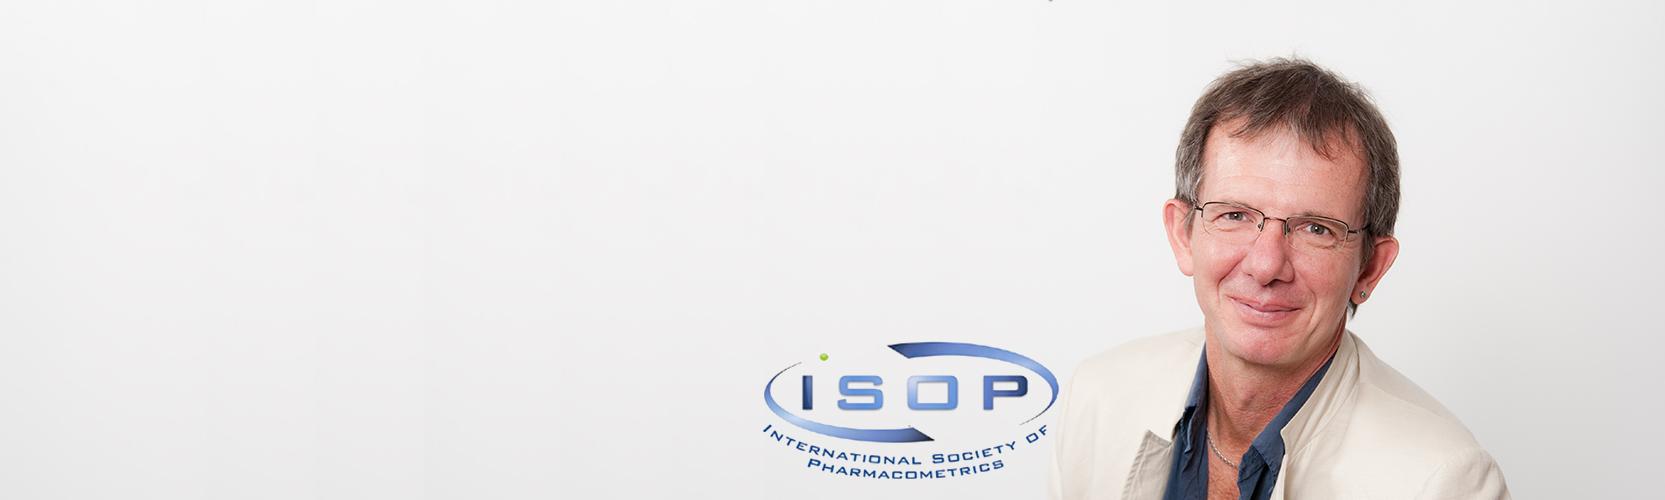 Marc Lavielle received the 2015 ISoP (International Society of Pharmacometrics) Innovation award